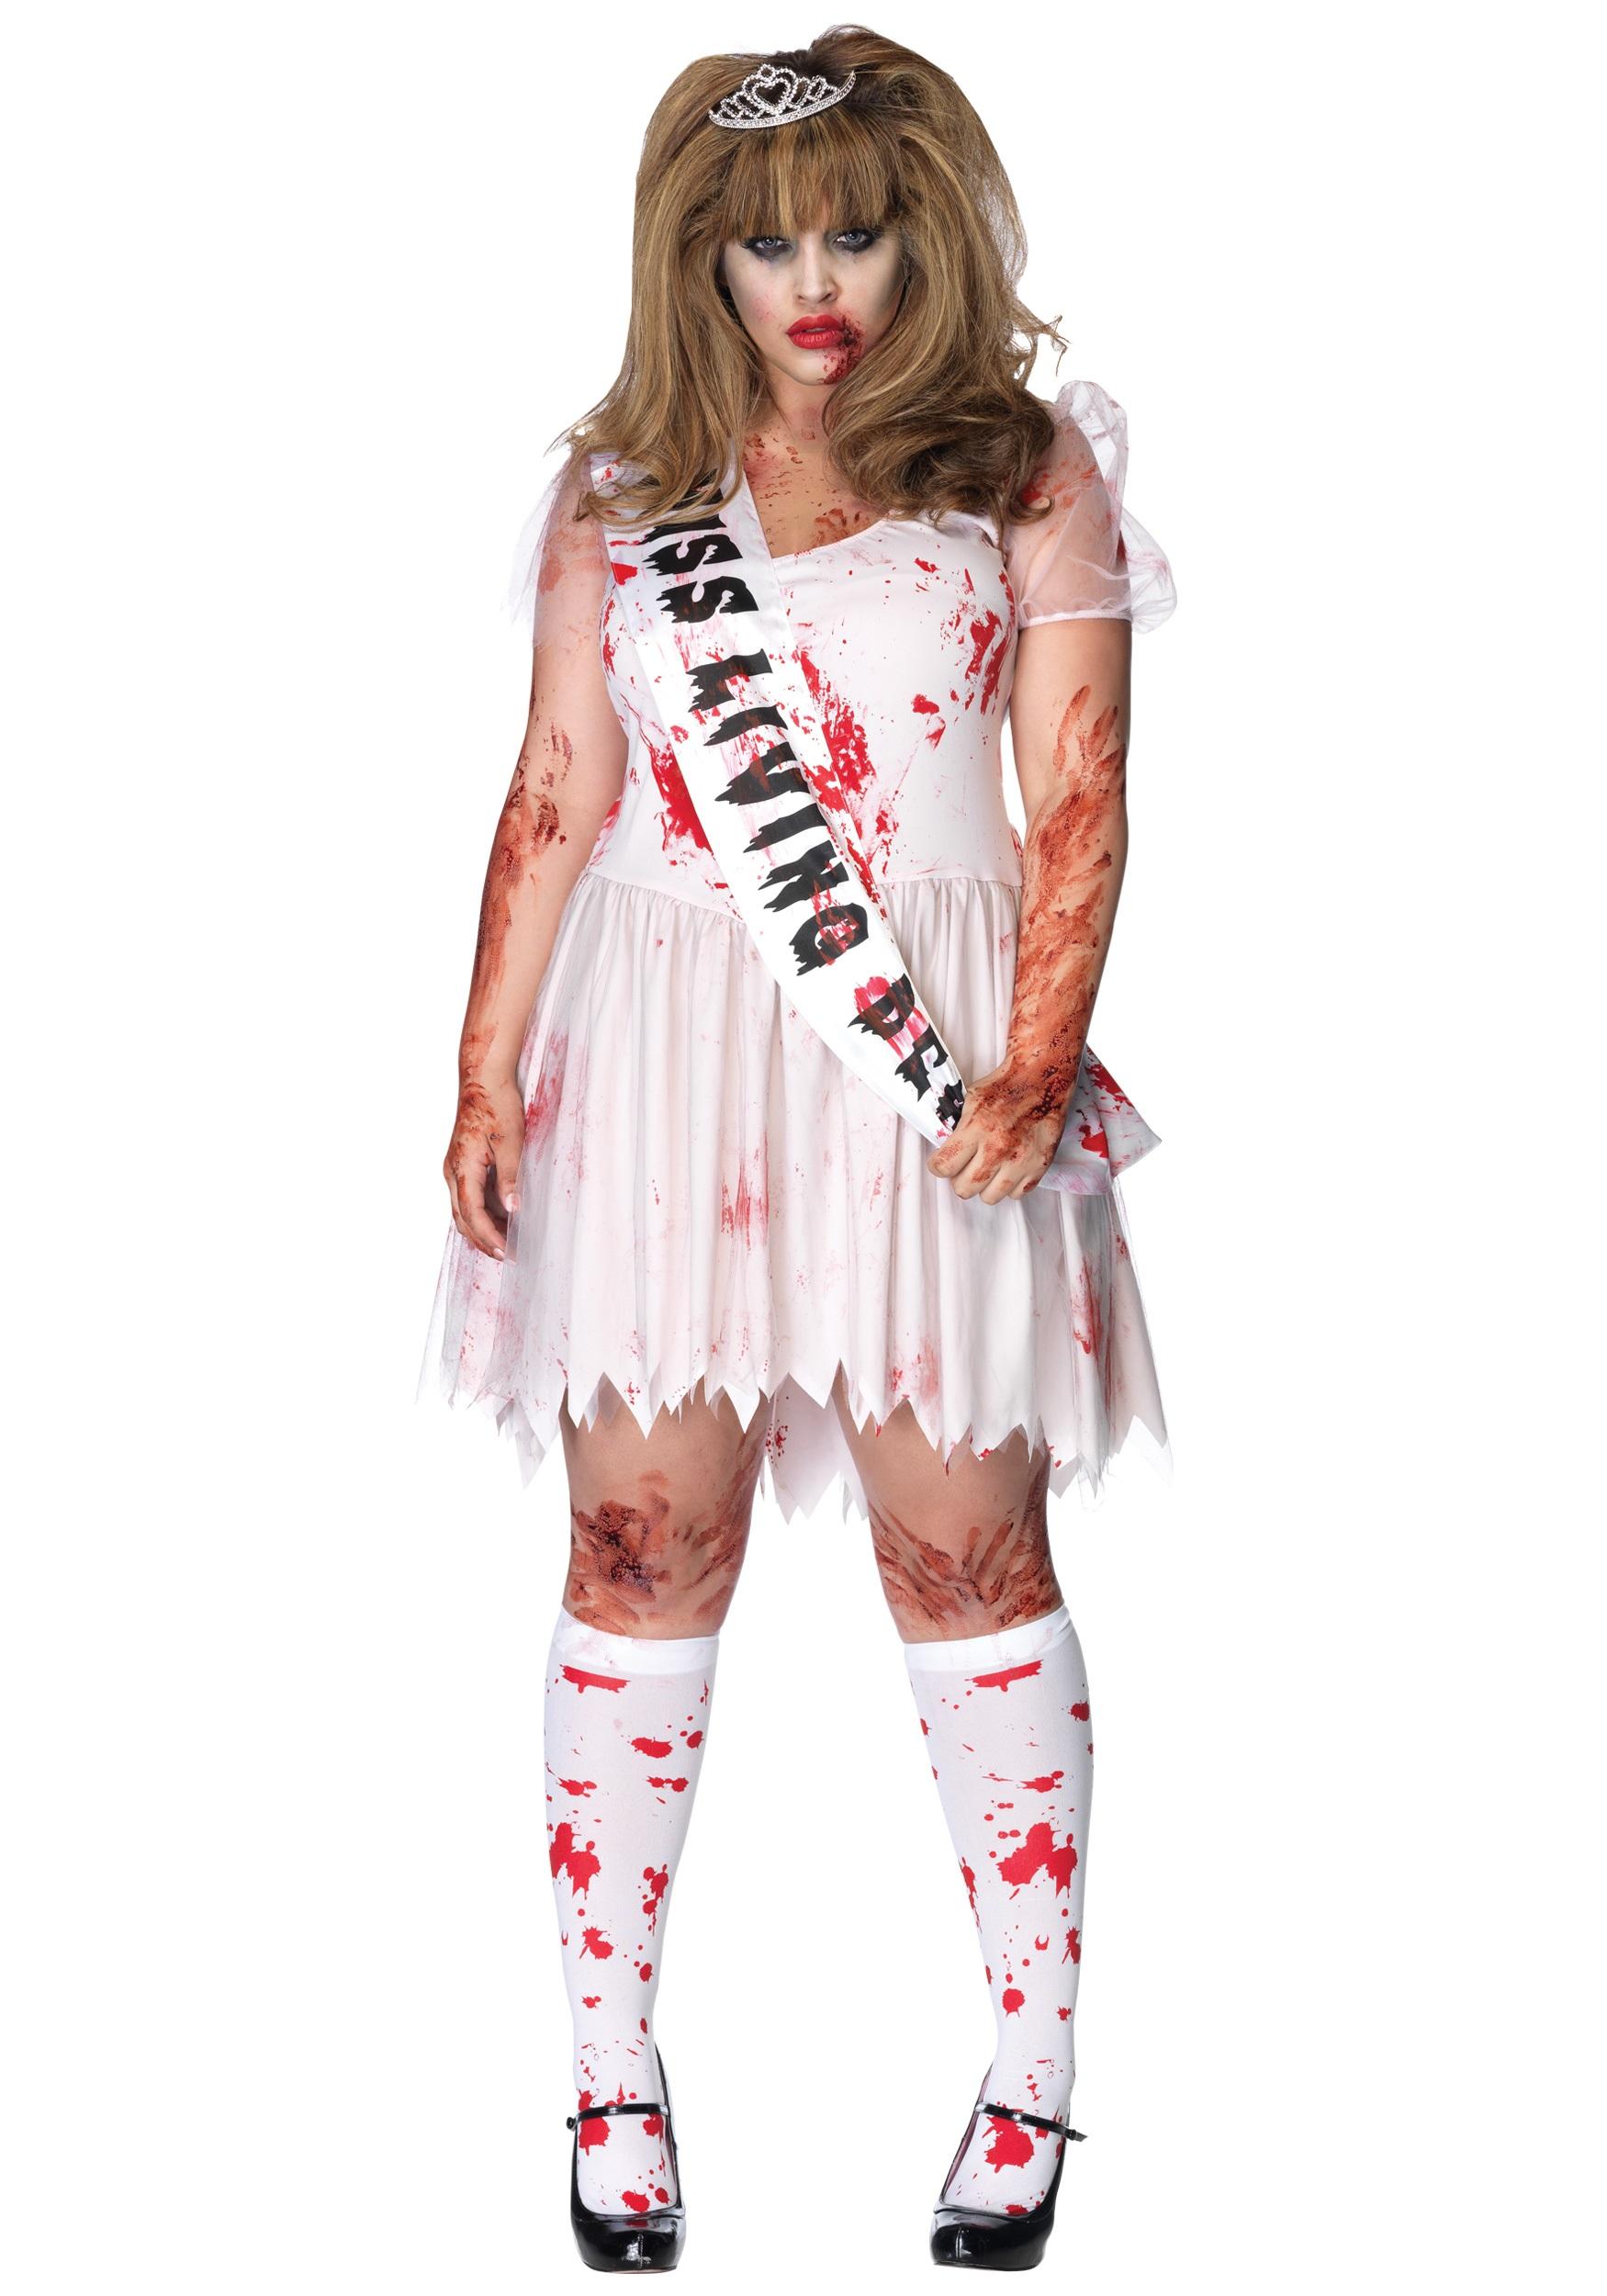 Легкий костюм на хэллоуин своими руками для девушки Бледная